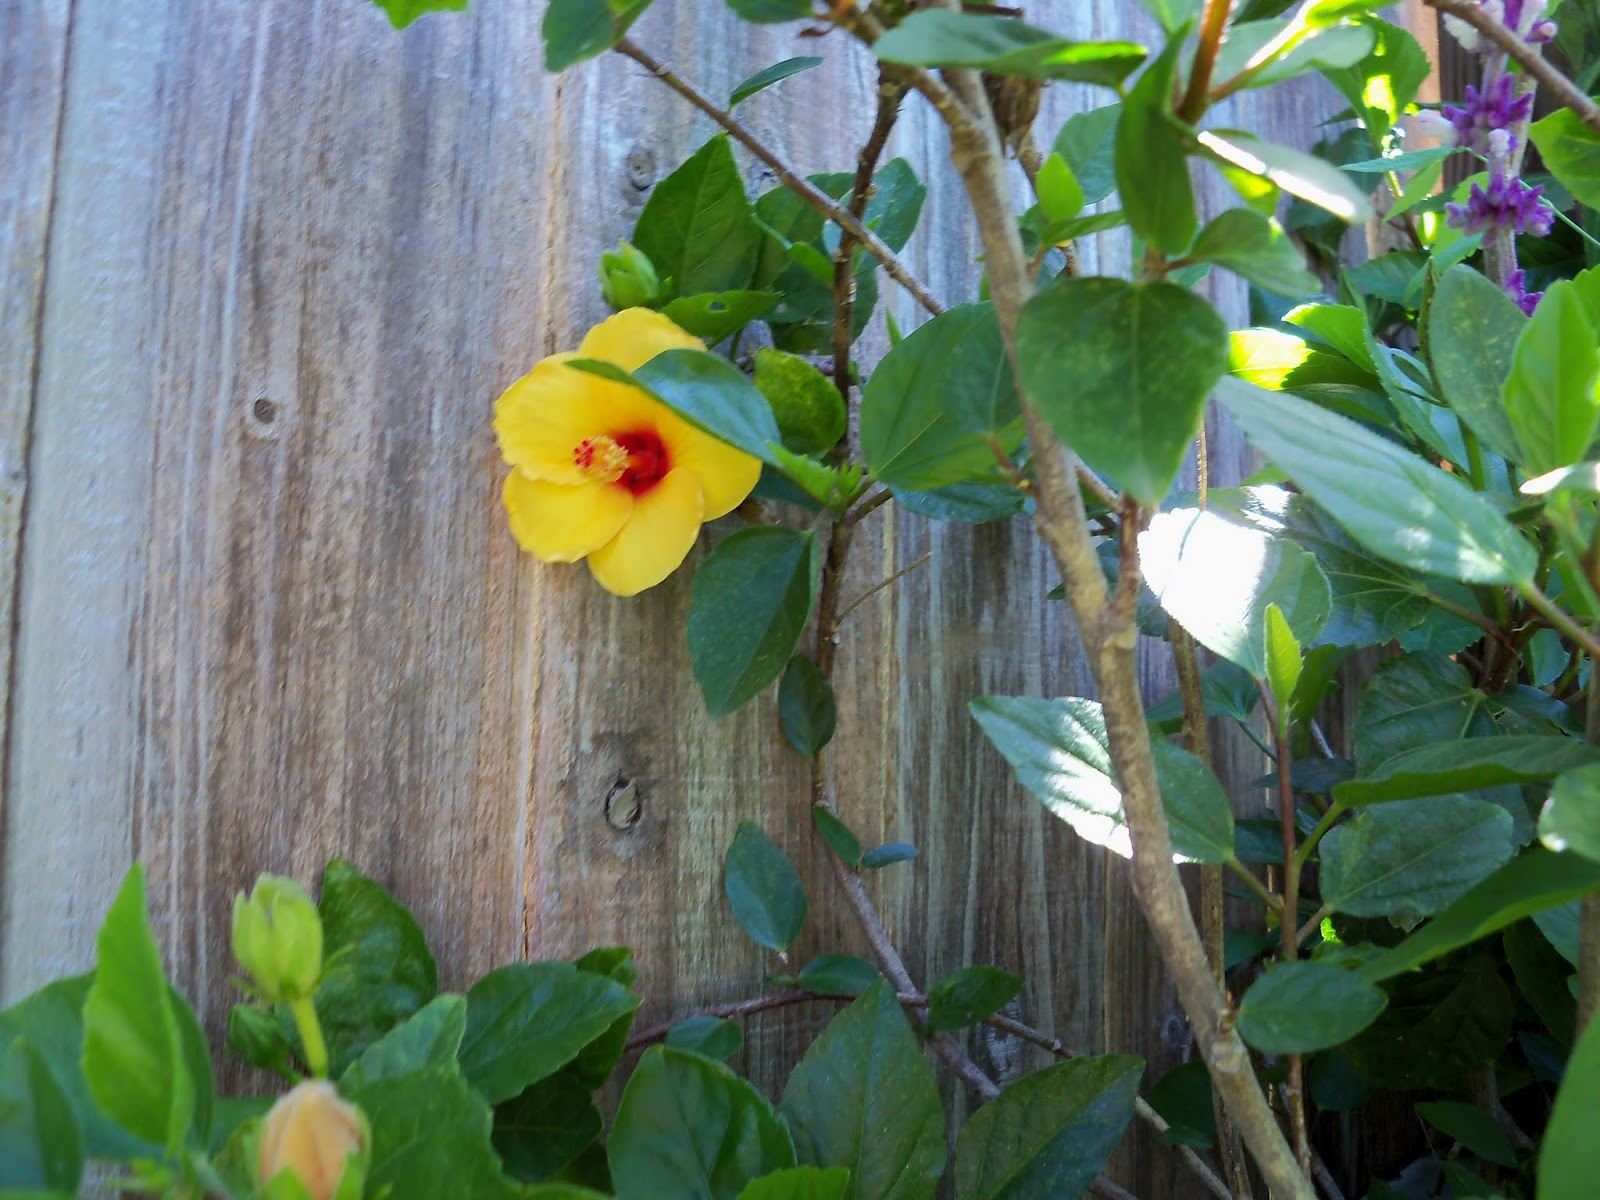 Gardening 2013 - 115_6278.JPG